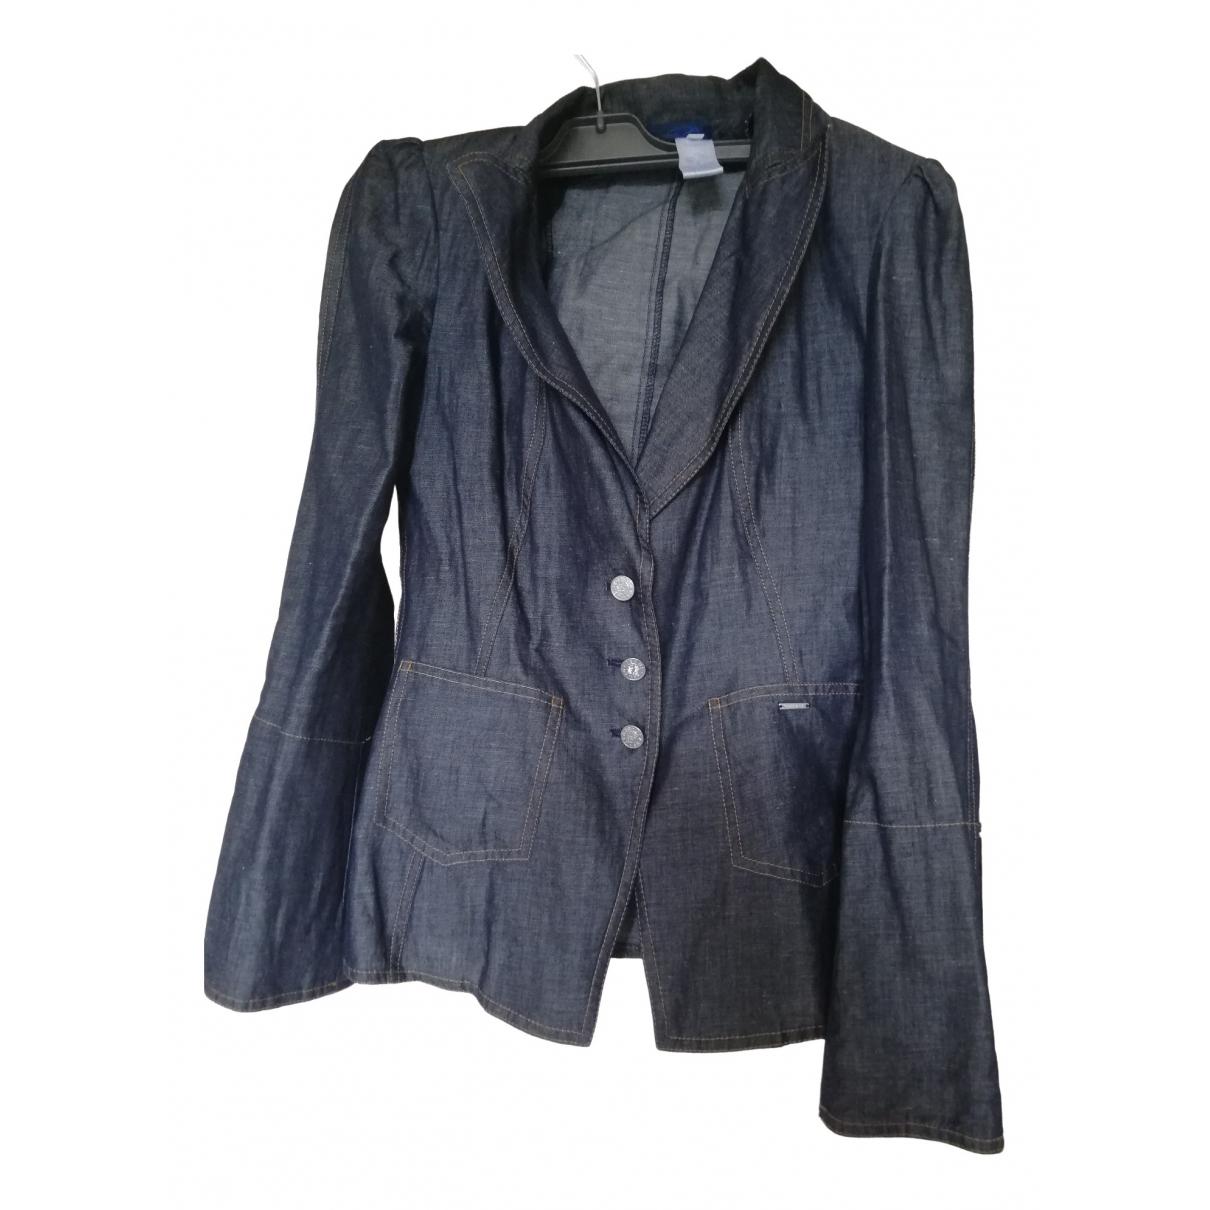 Kenzo \N Blue Denim - Jeans jacket for Women 36 FR